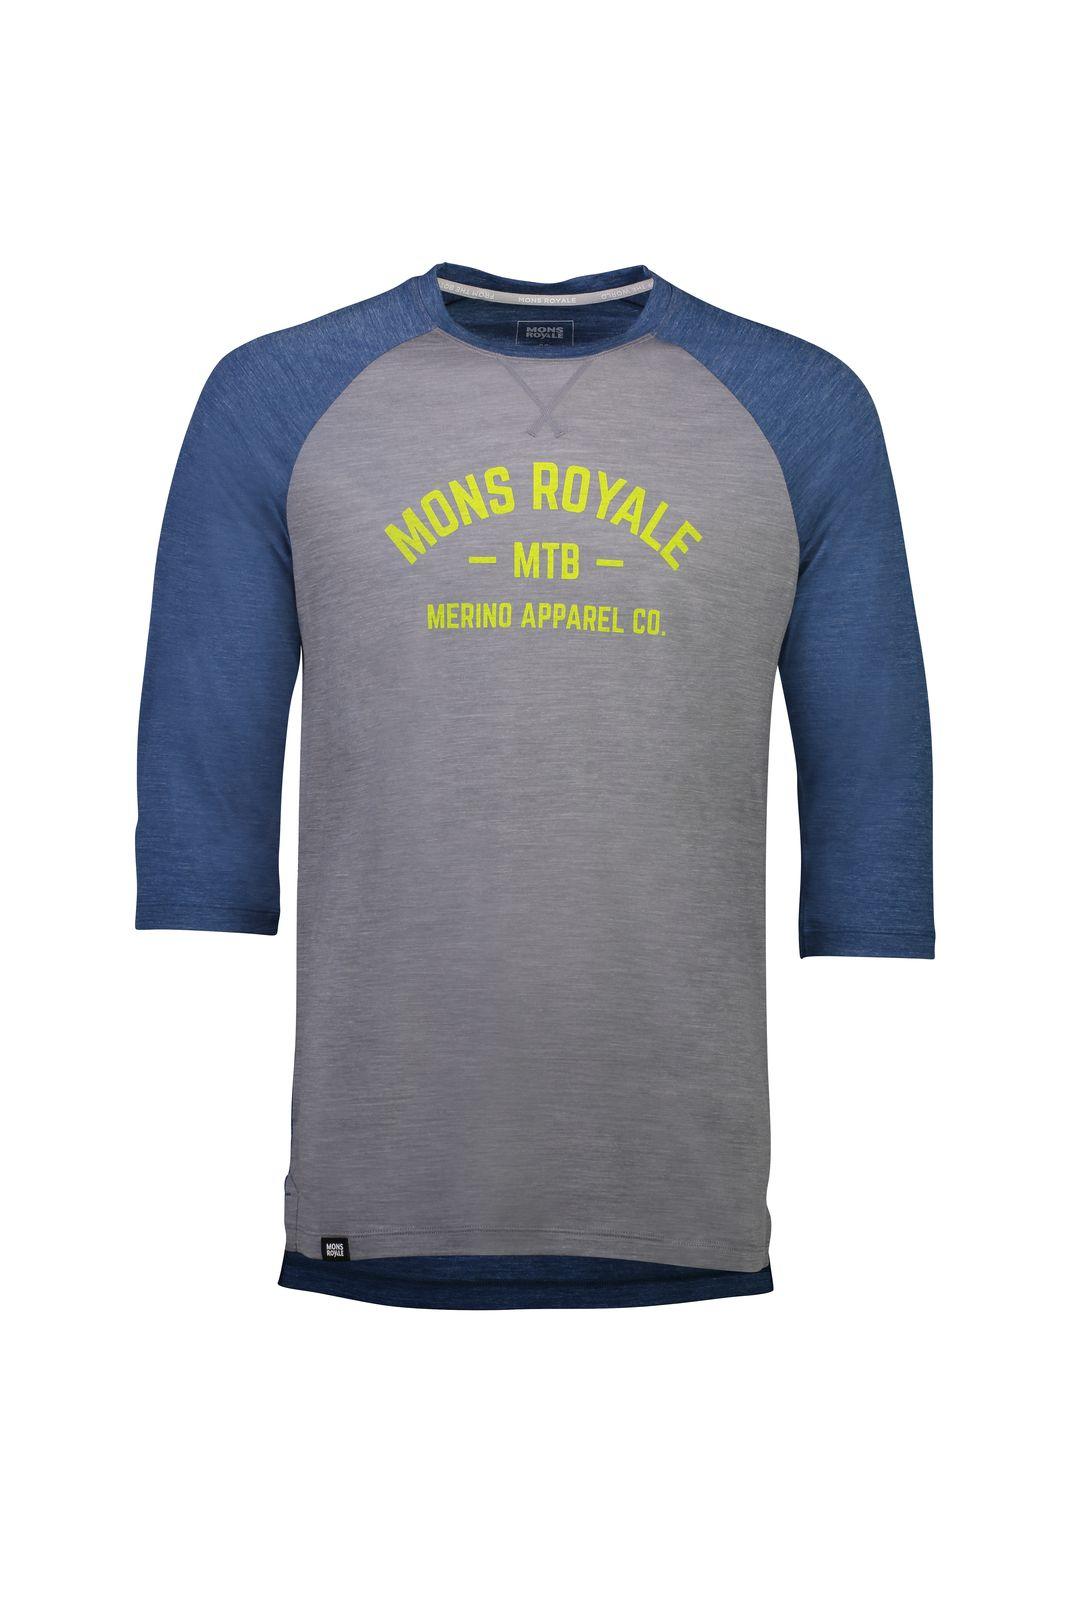 MONS ROYALE Vapour Lite 3/4 - Cykeltrøje - Blå/Grå | Jerseys